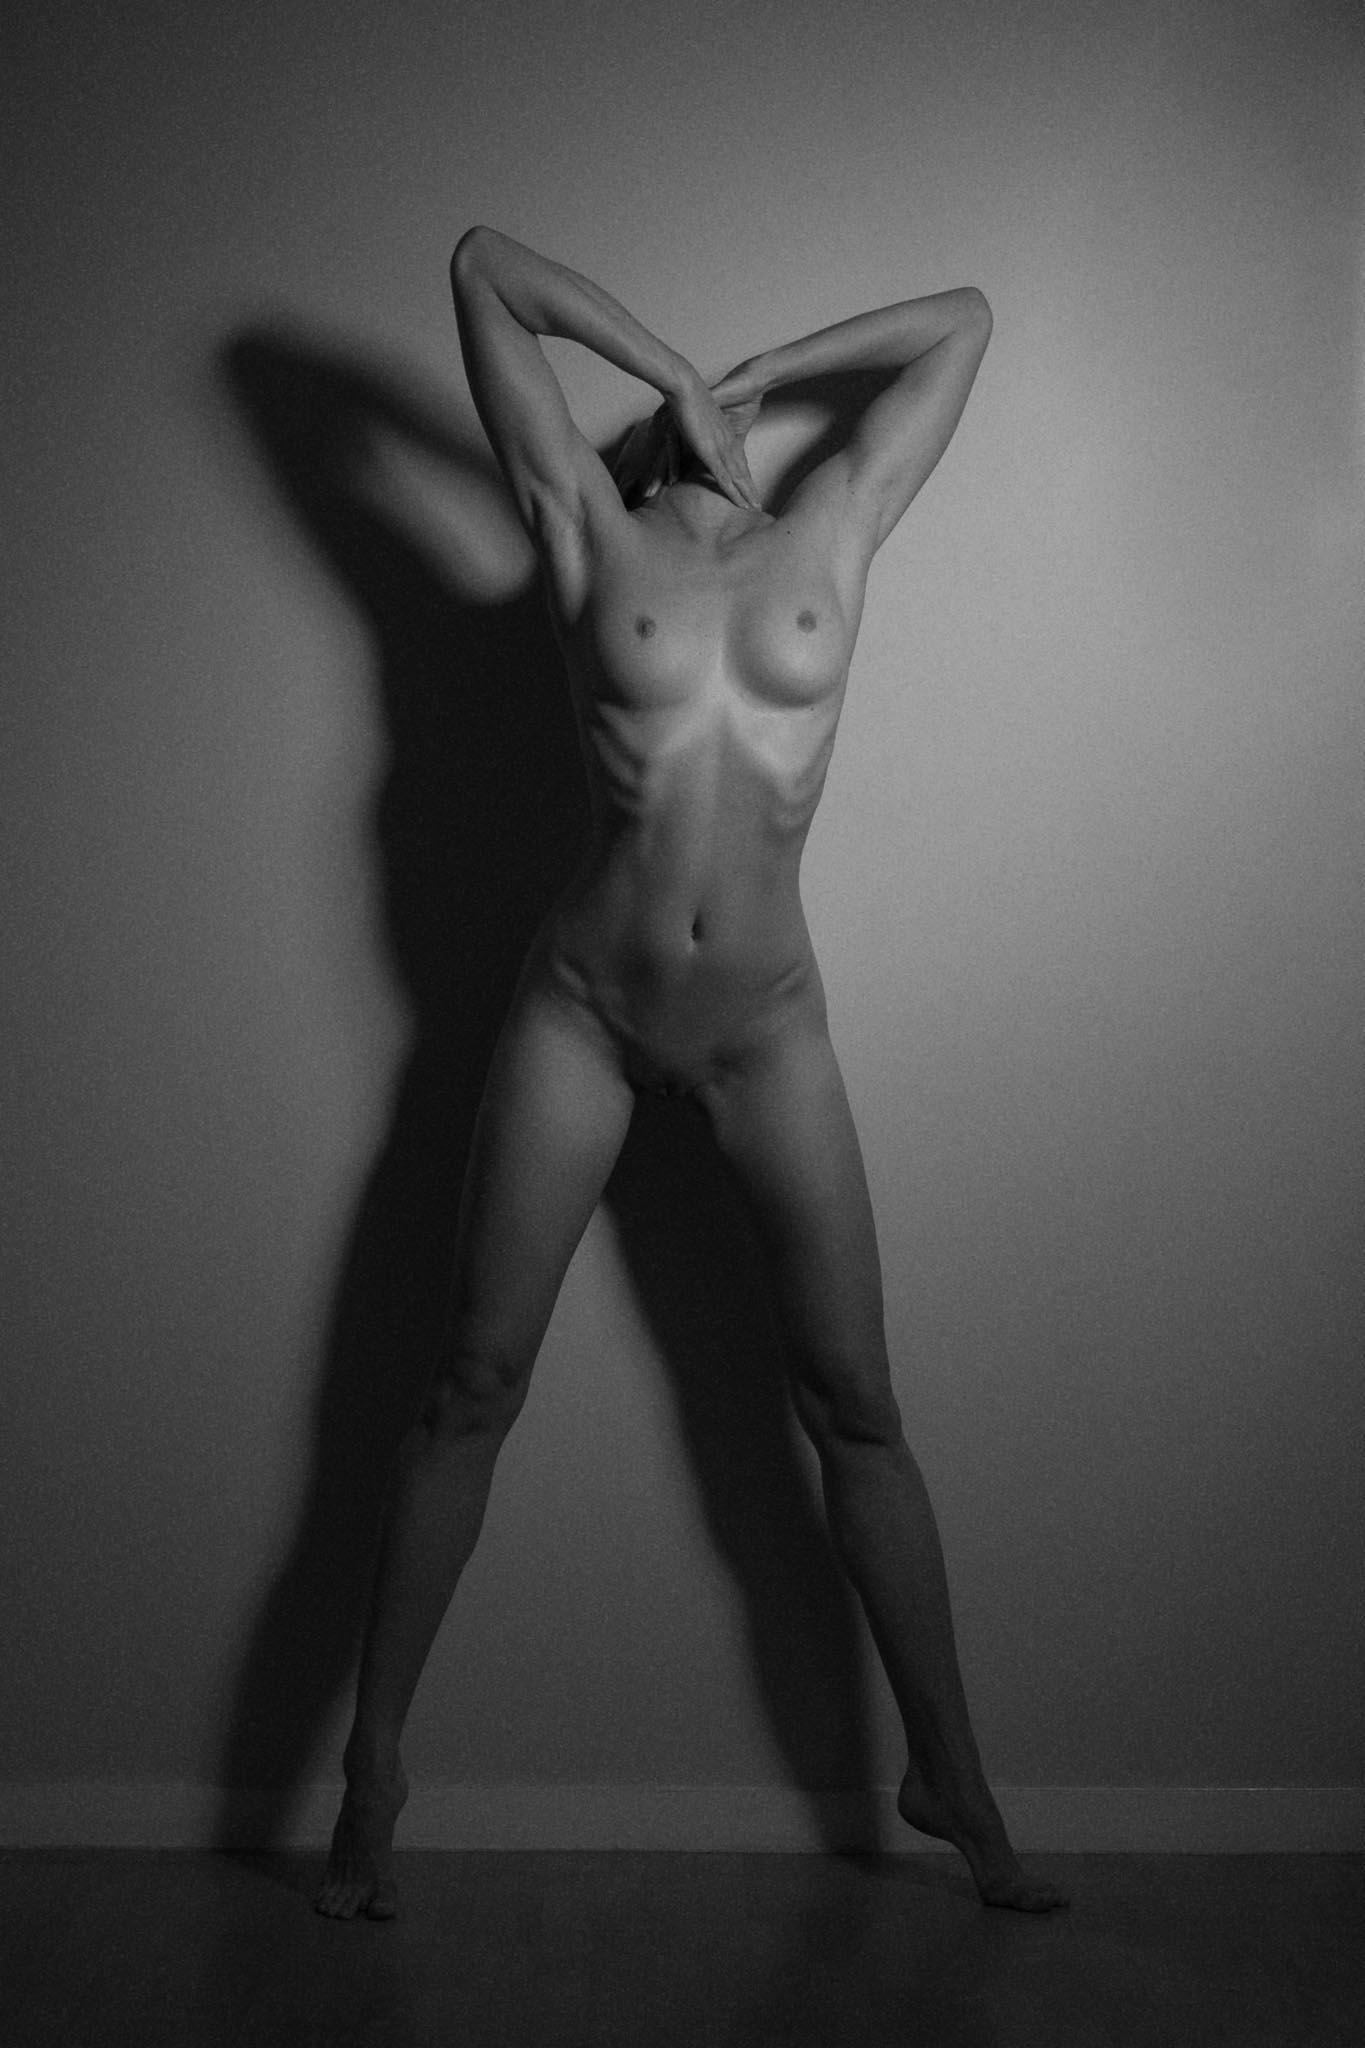 Model: Camille Cojan @cafeealacreme